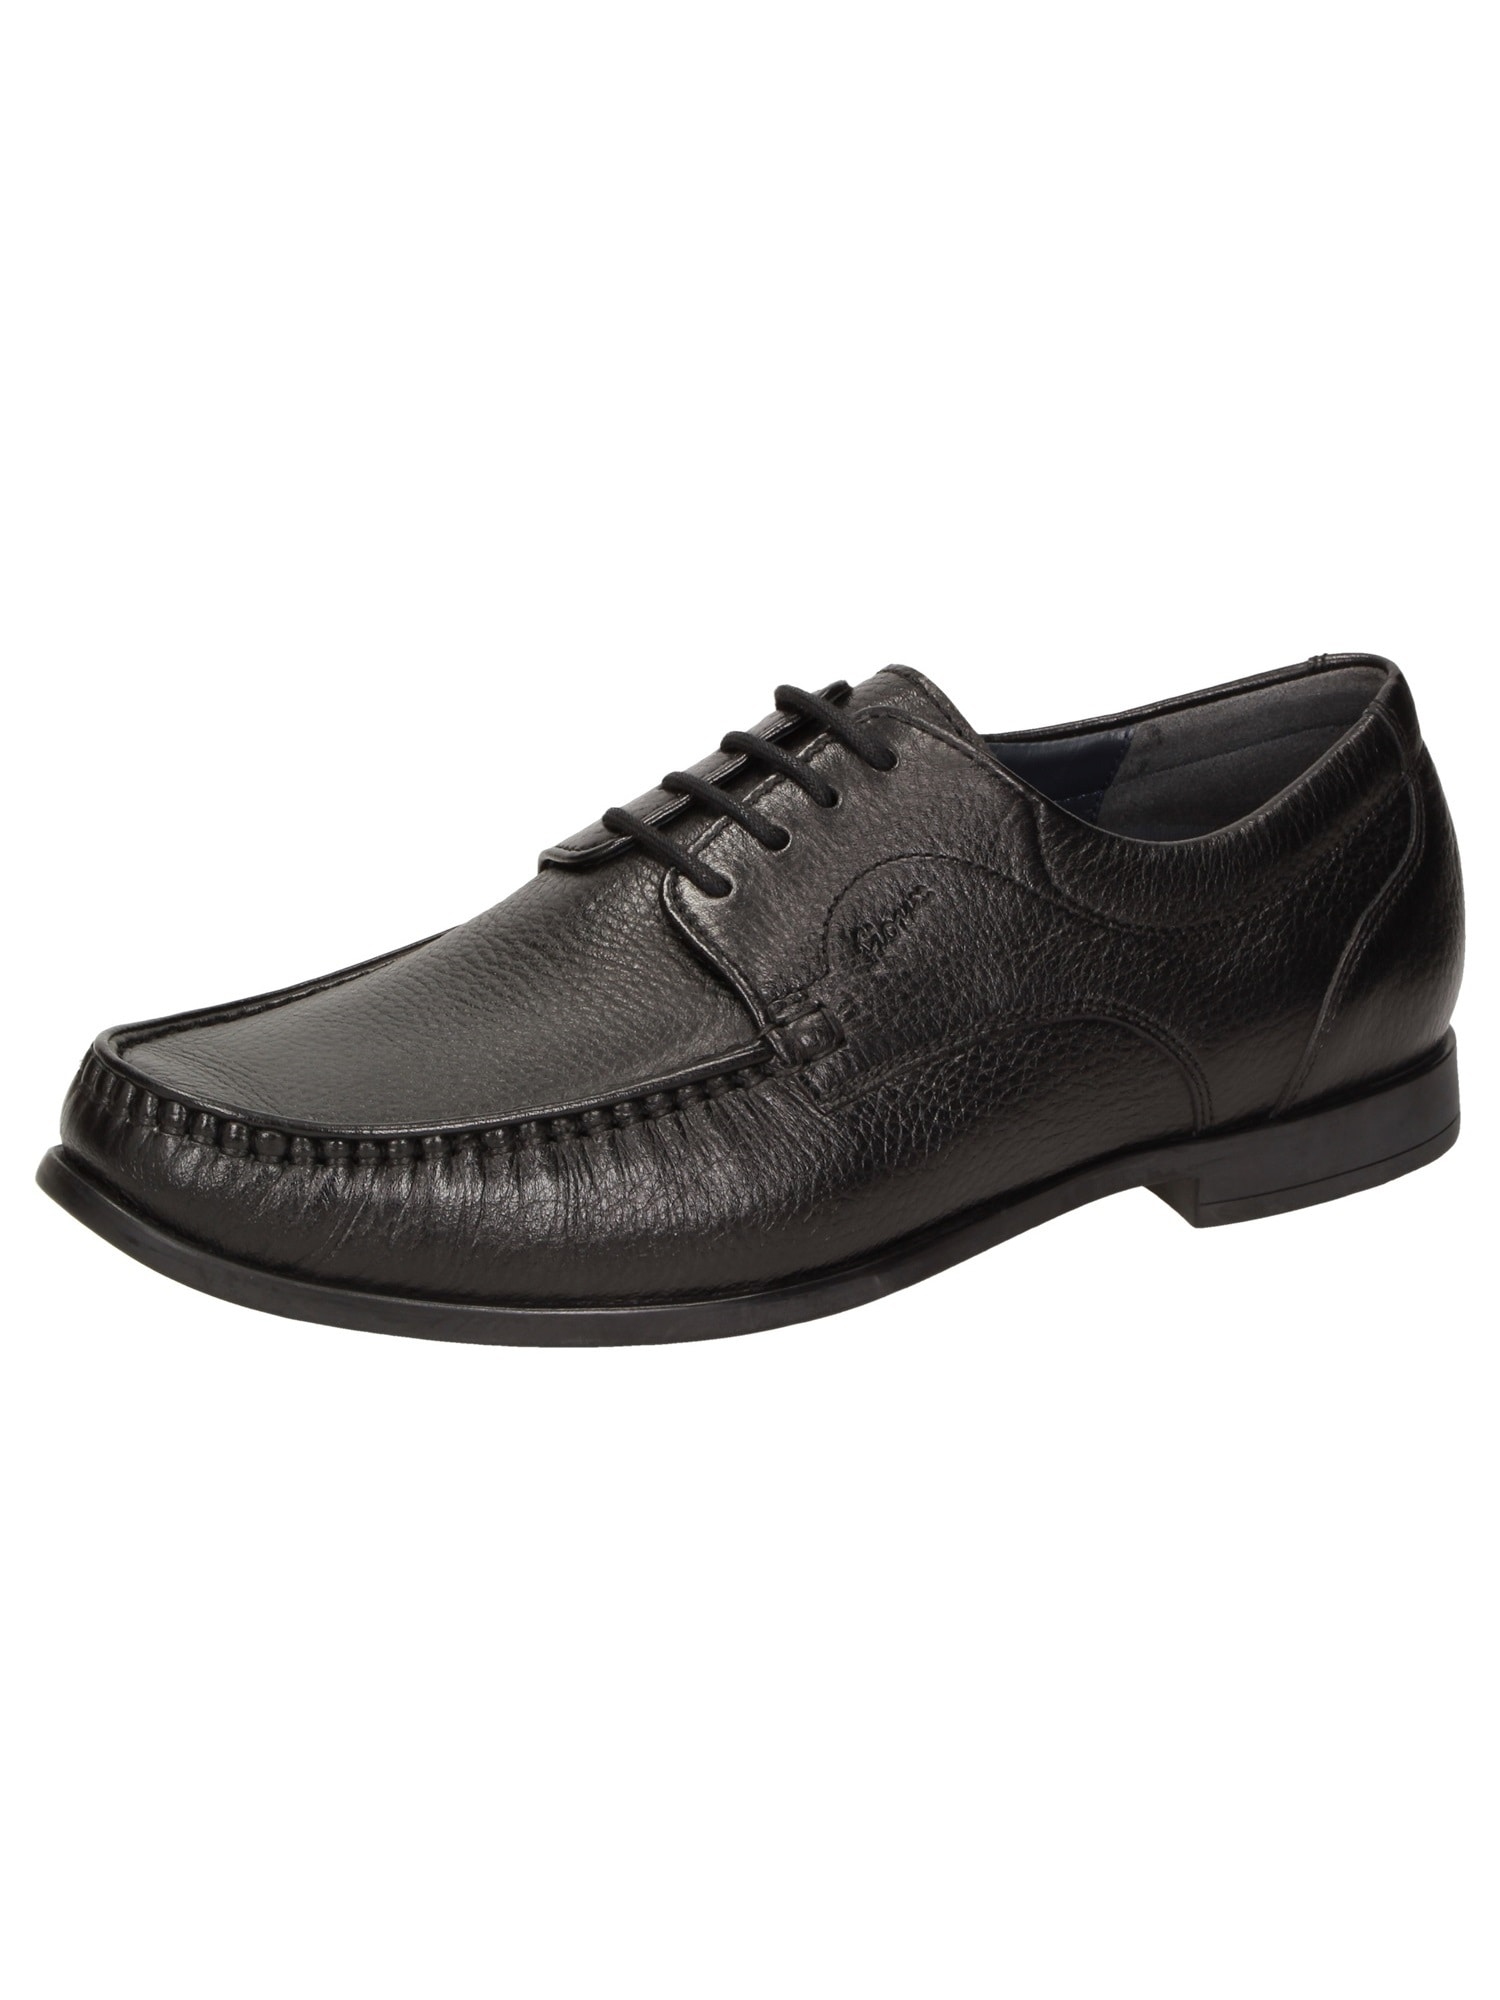 Mokassin ' Edelix-701 ' | Schuhe > Mokassins | Sioux